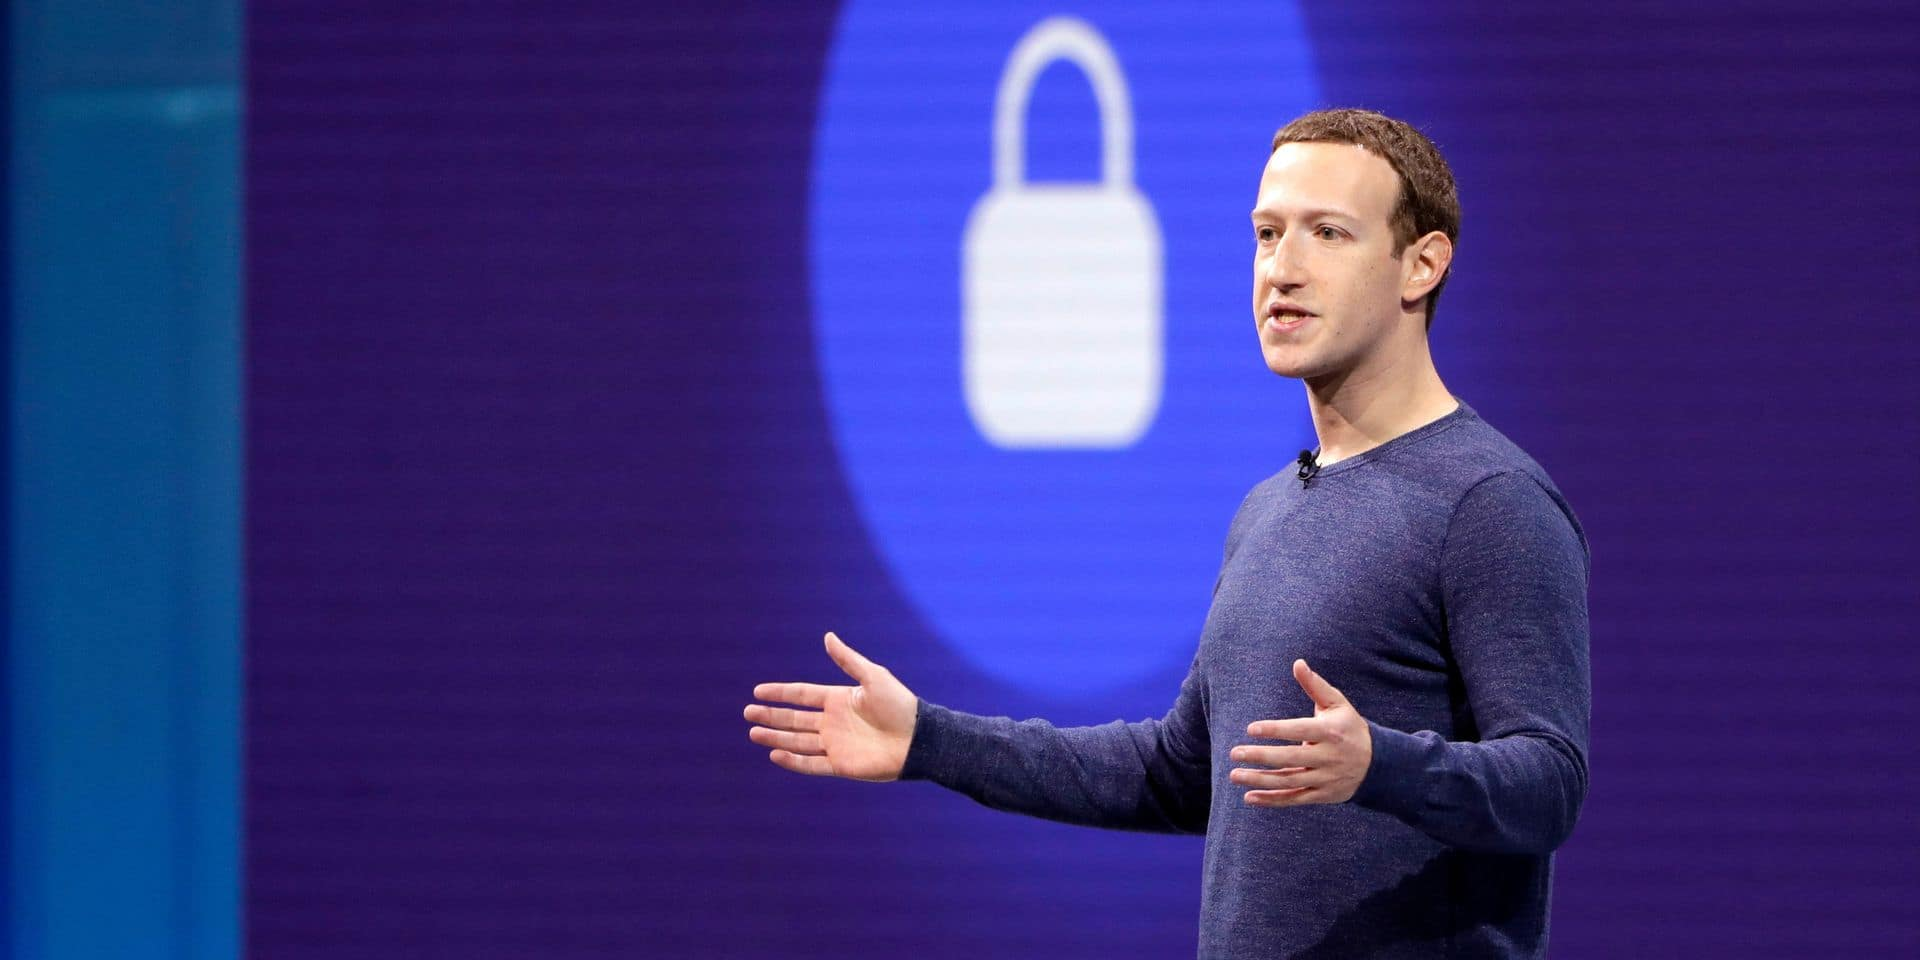 Le patron de Facebook Mark Zuckerberg reçu vendredi à l'Elysée